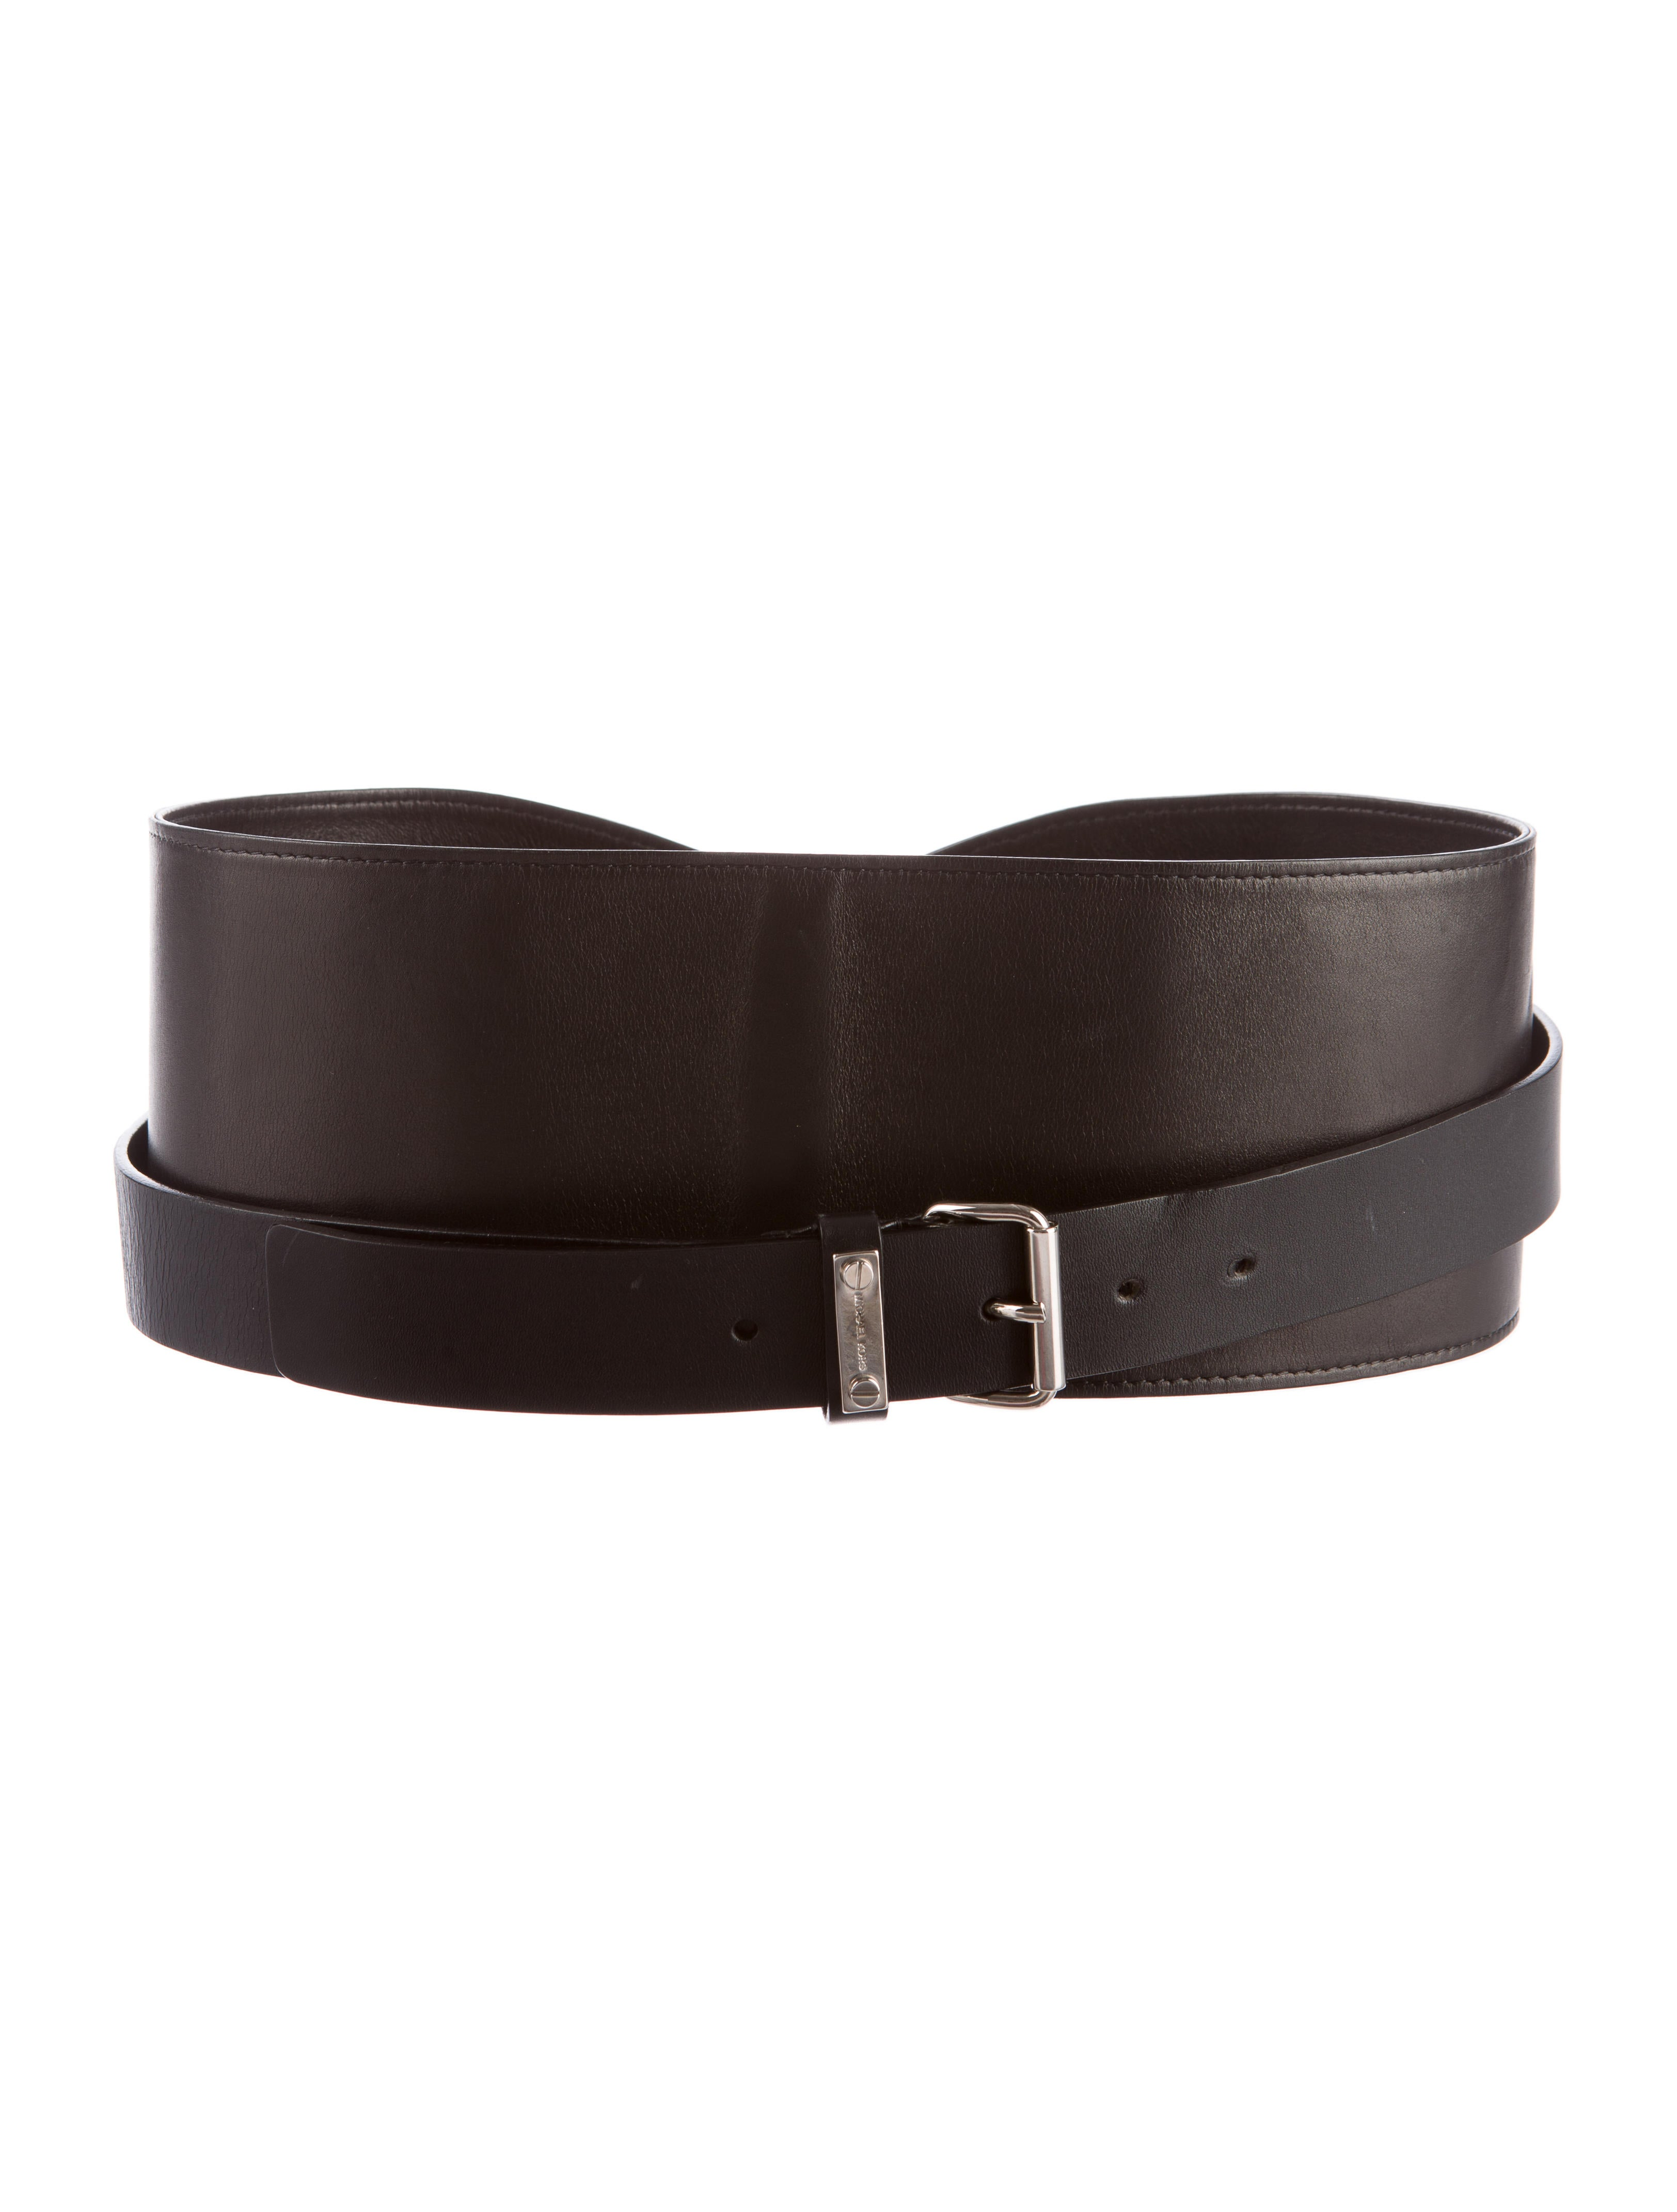 michael kors leather wrap around waist belt accessories